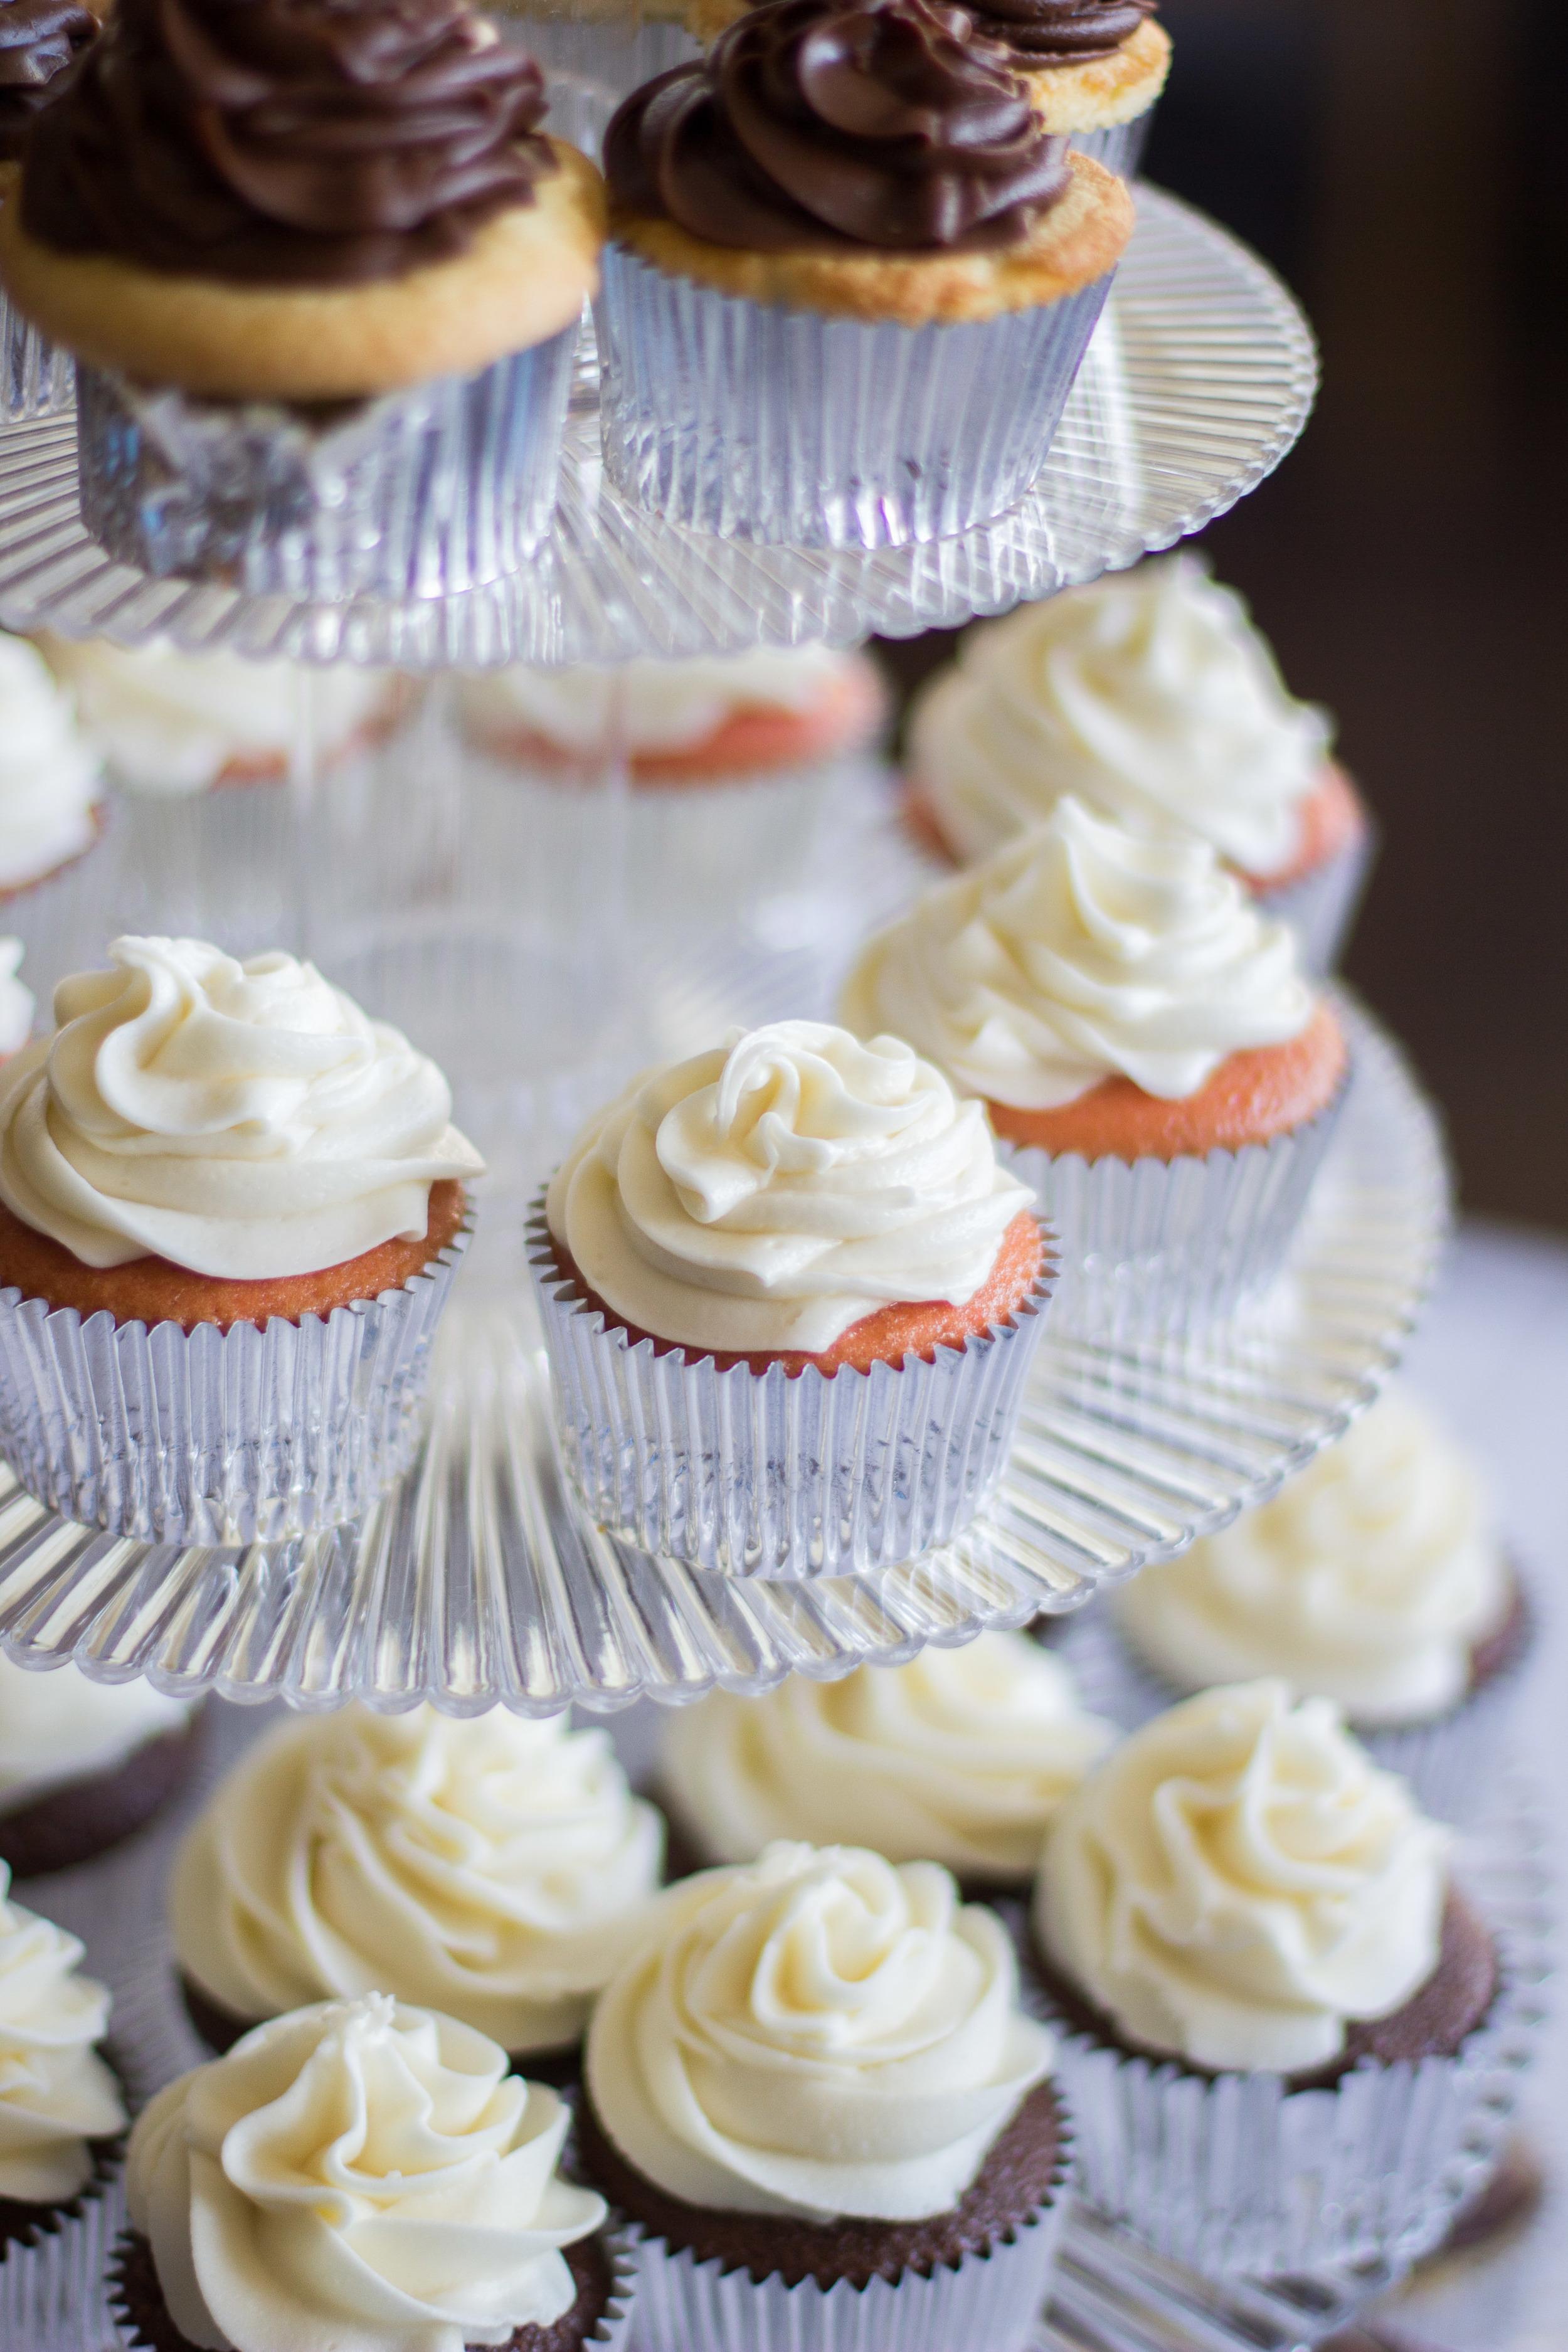 Cupcake Tier - Wedding Cake | Rustic Aqua Sea Wedding Decor | Martinsborough Wedding Reception - Greenville NC | Bryant Tyson Photography